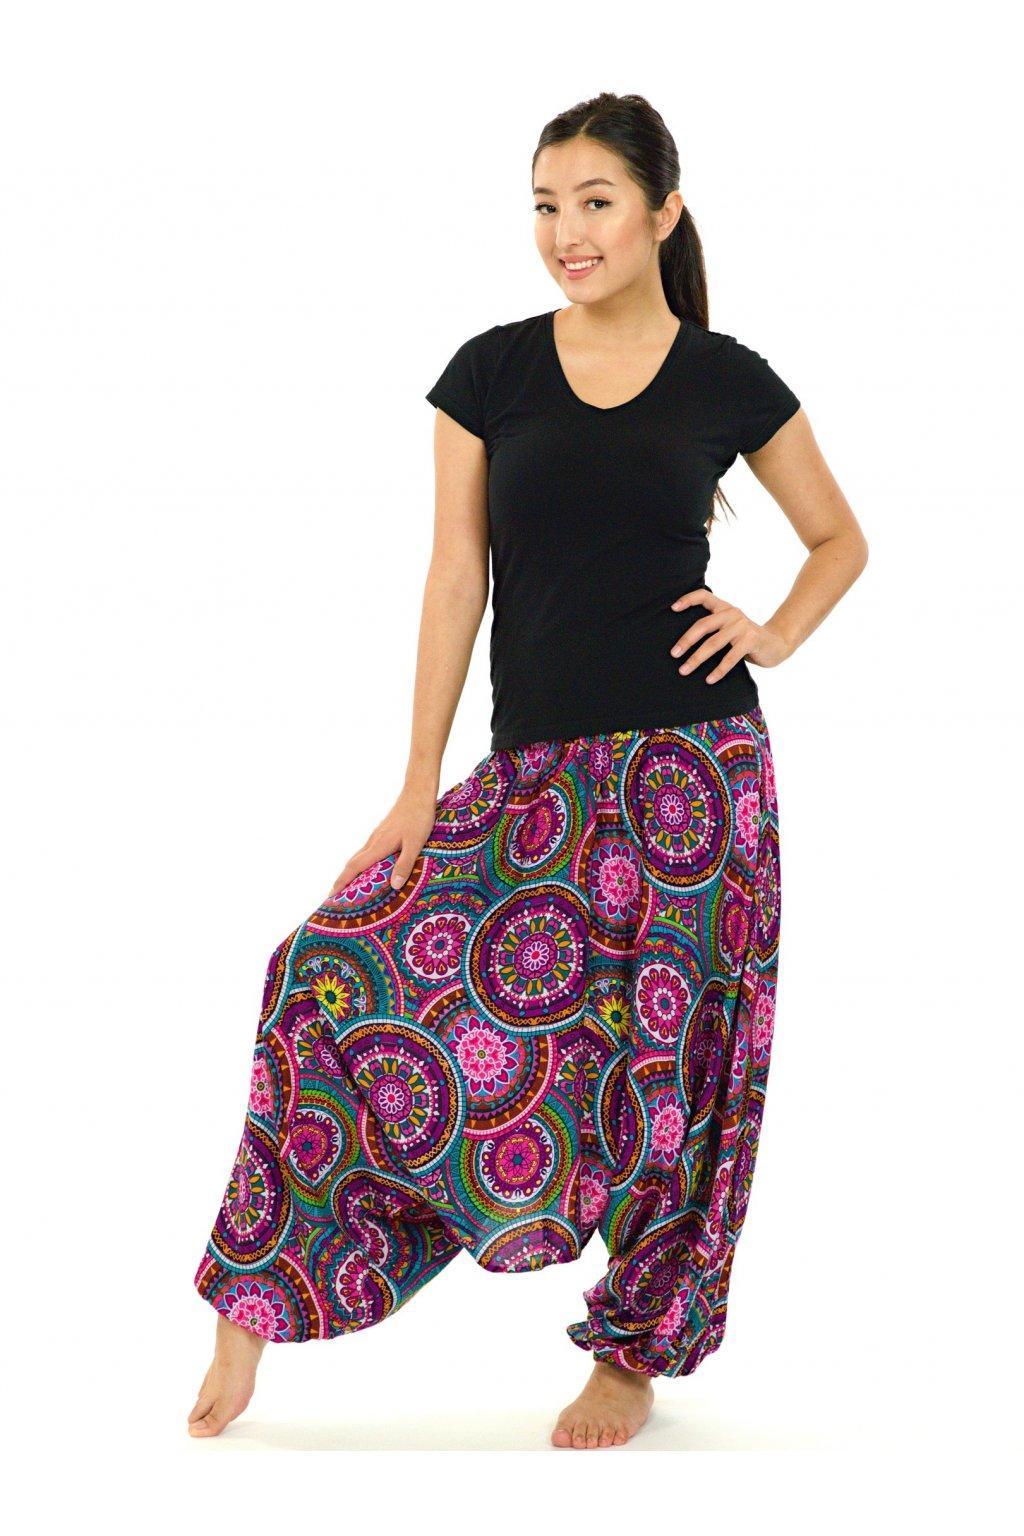 Kalhoty-šaty-top 3v1 Tehani - barevné